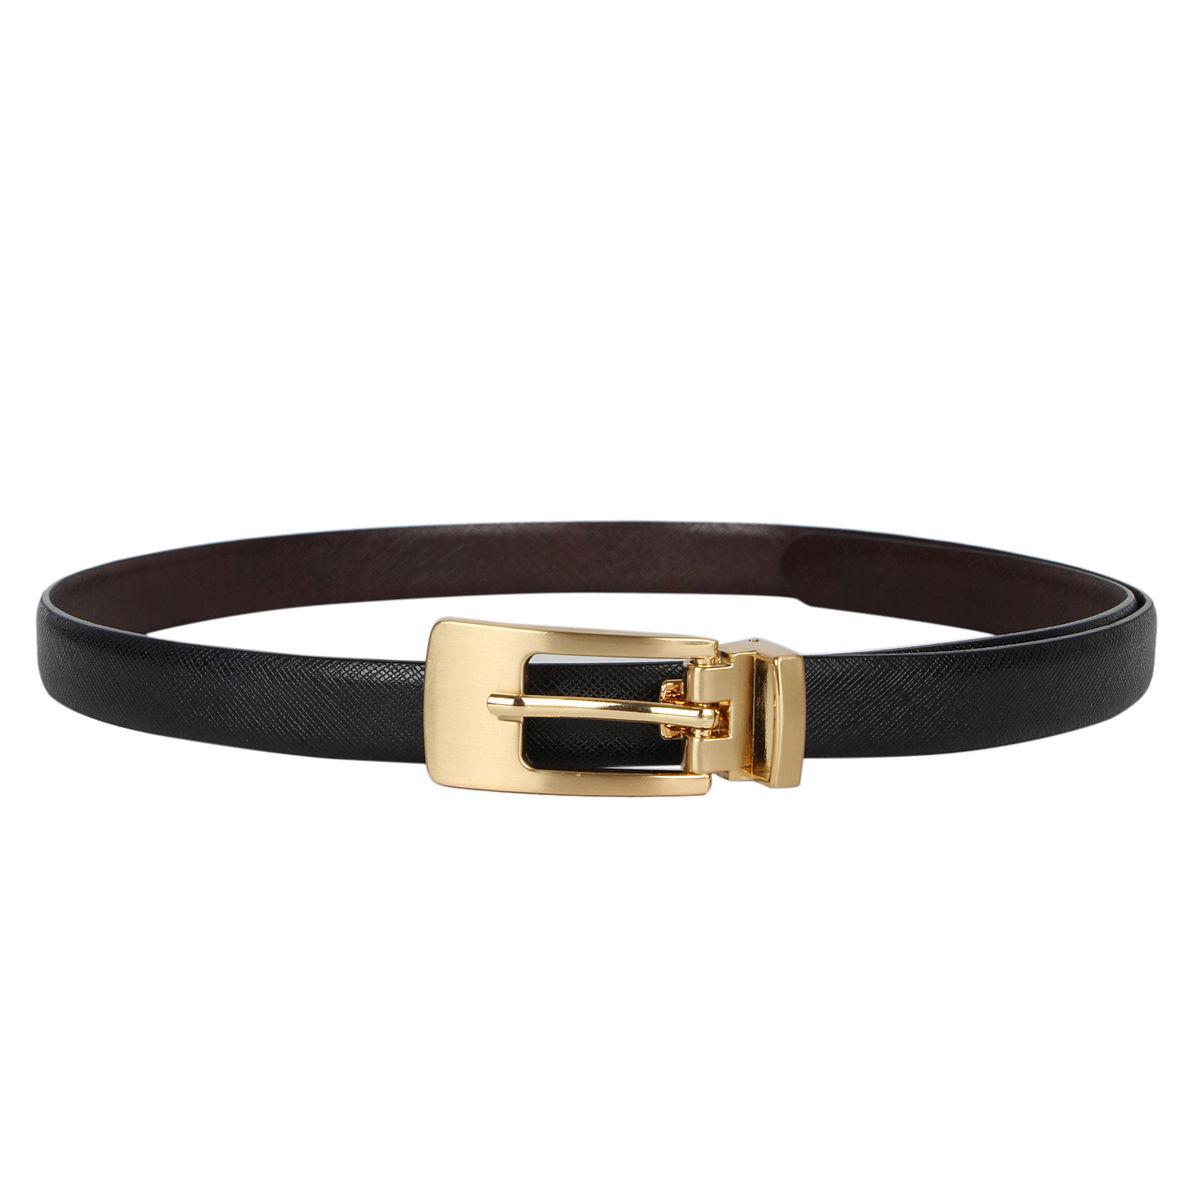 ... Da Milano Black Ladies Belt · zoom ... 3f4450b37c